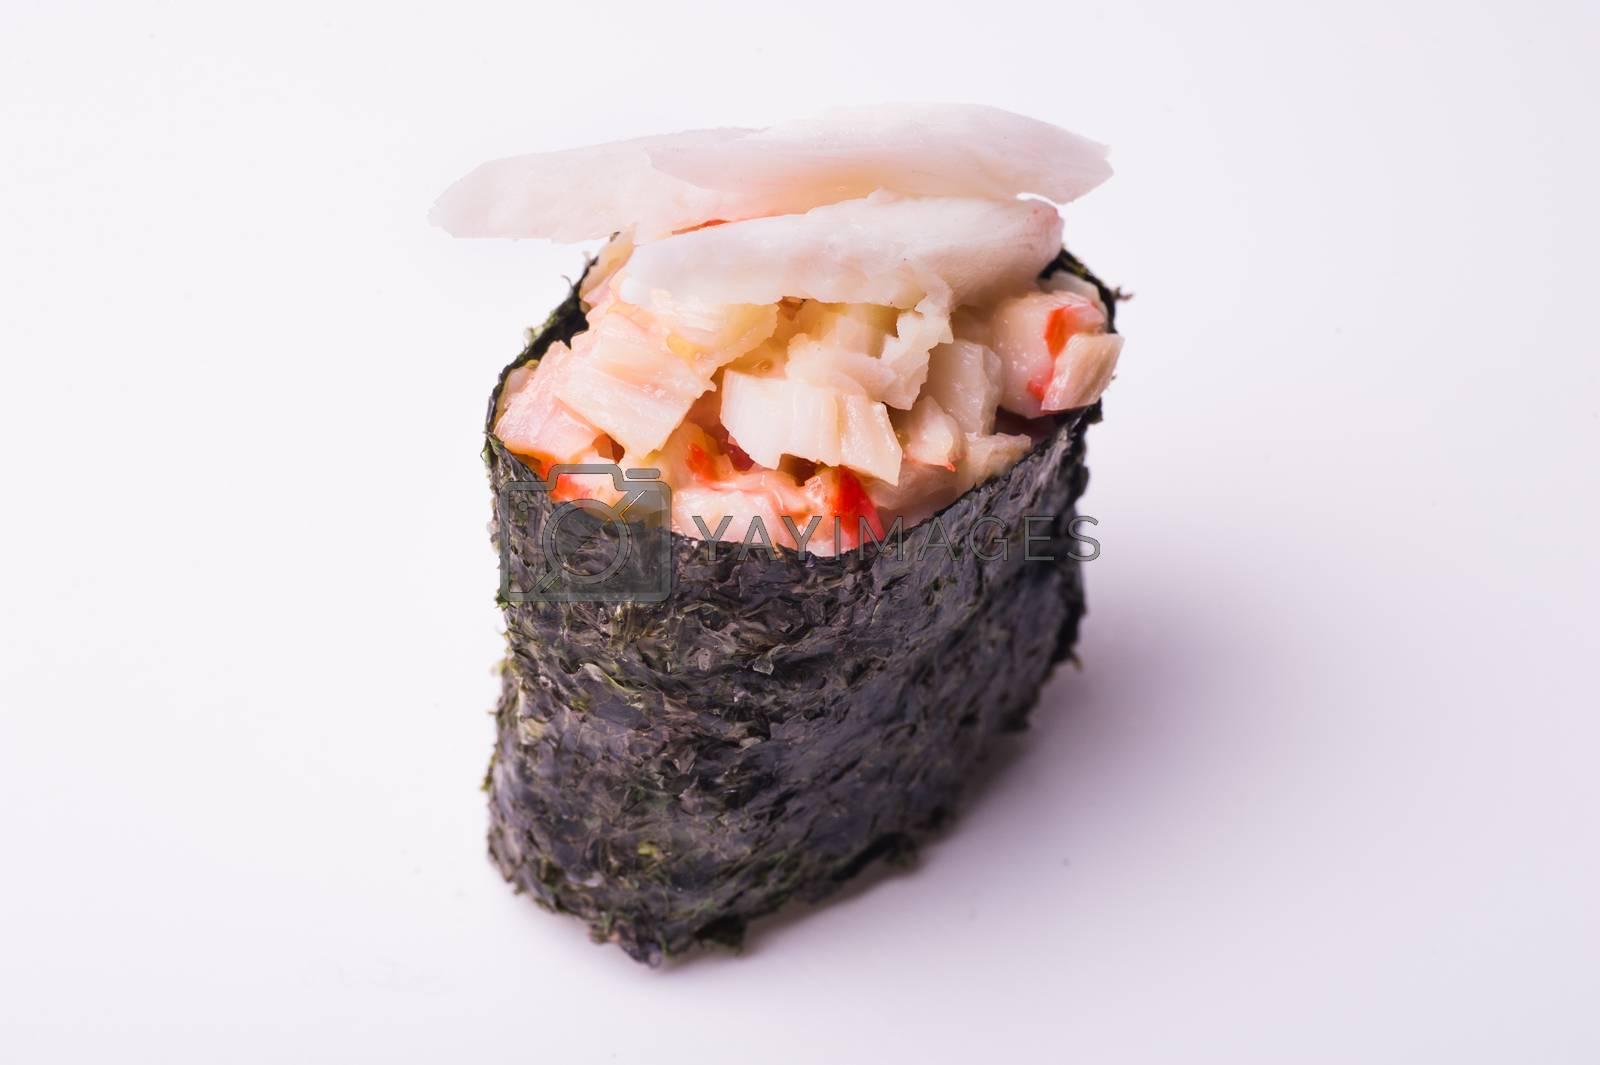 crab gunkan sushi isolated on white background